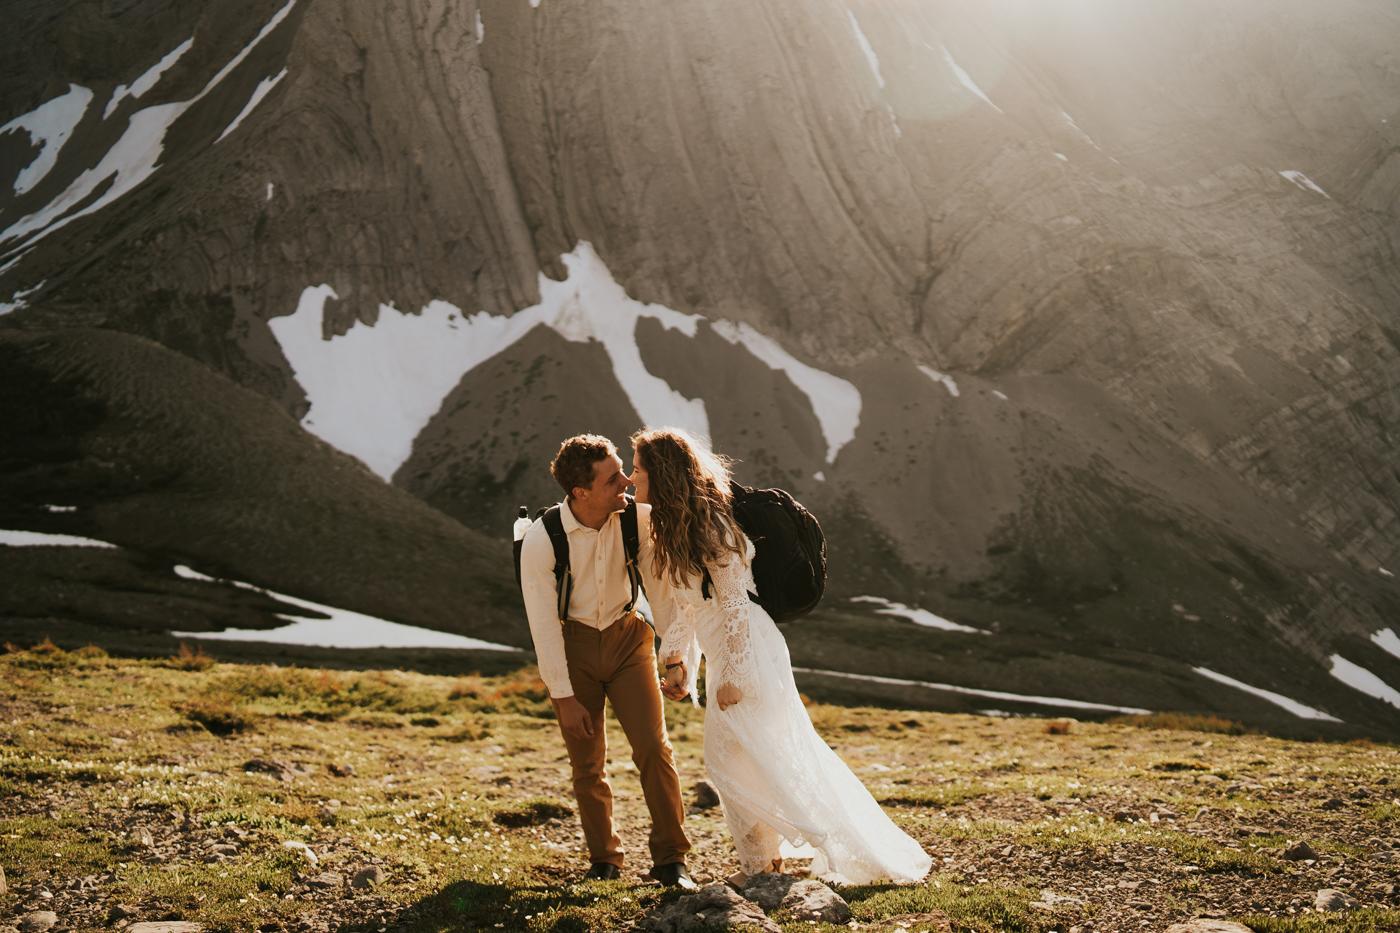 tyraephotography_photographer_wedding_elopement_engagement_photography-08471.jpg